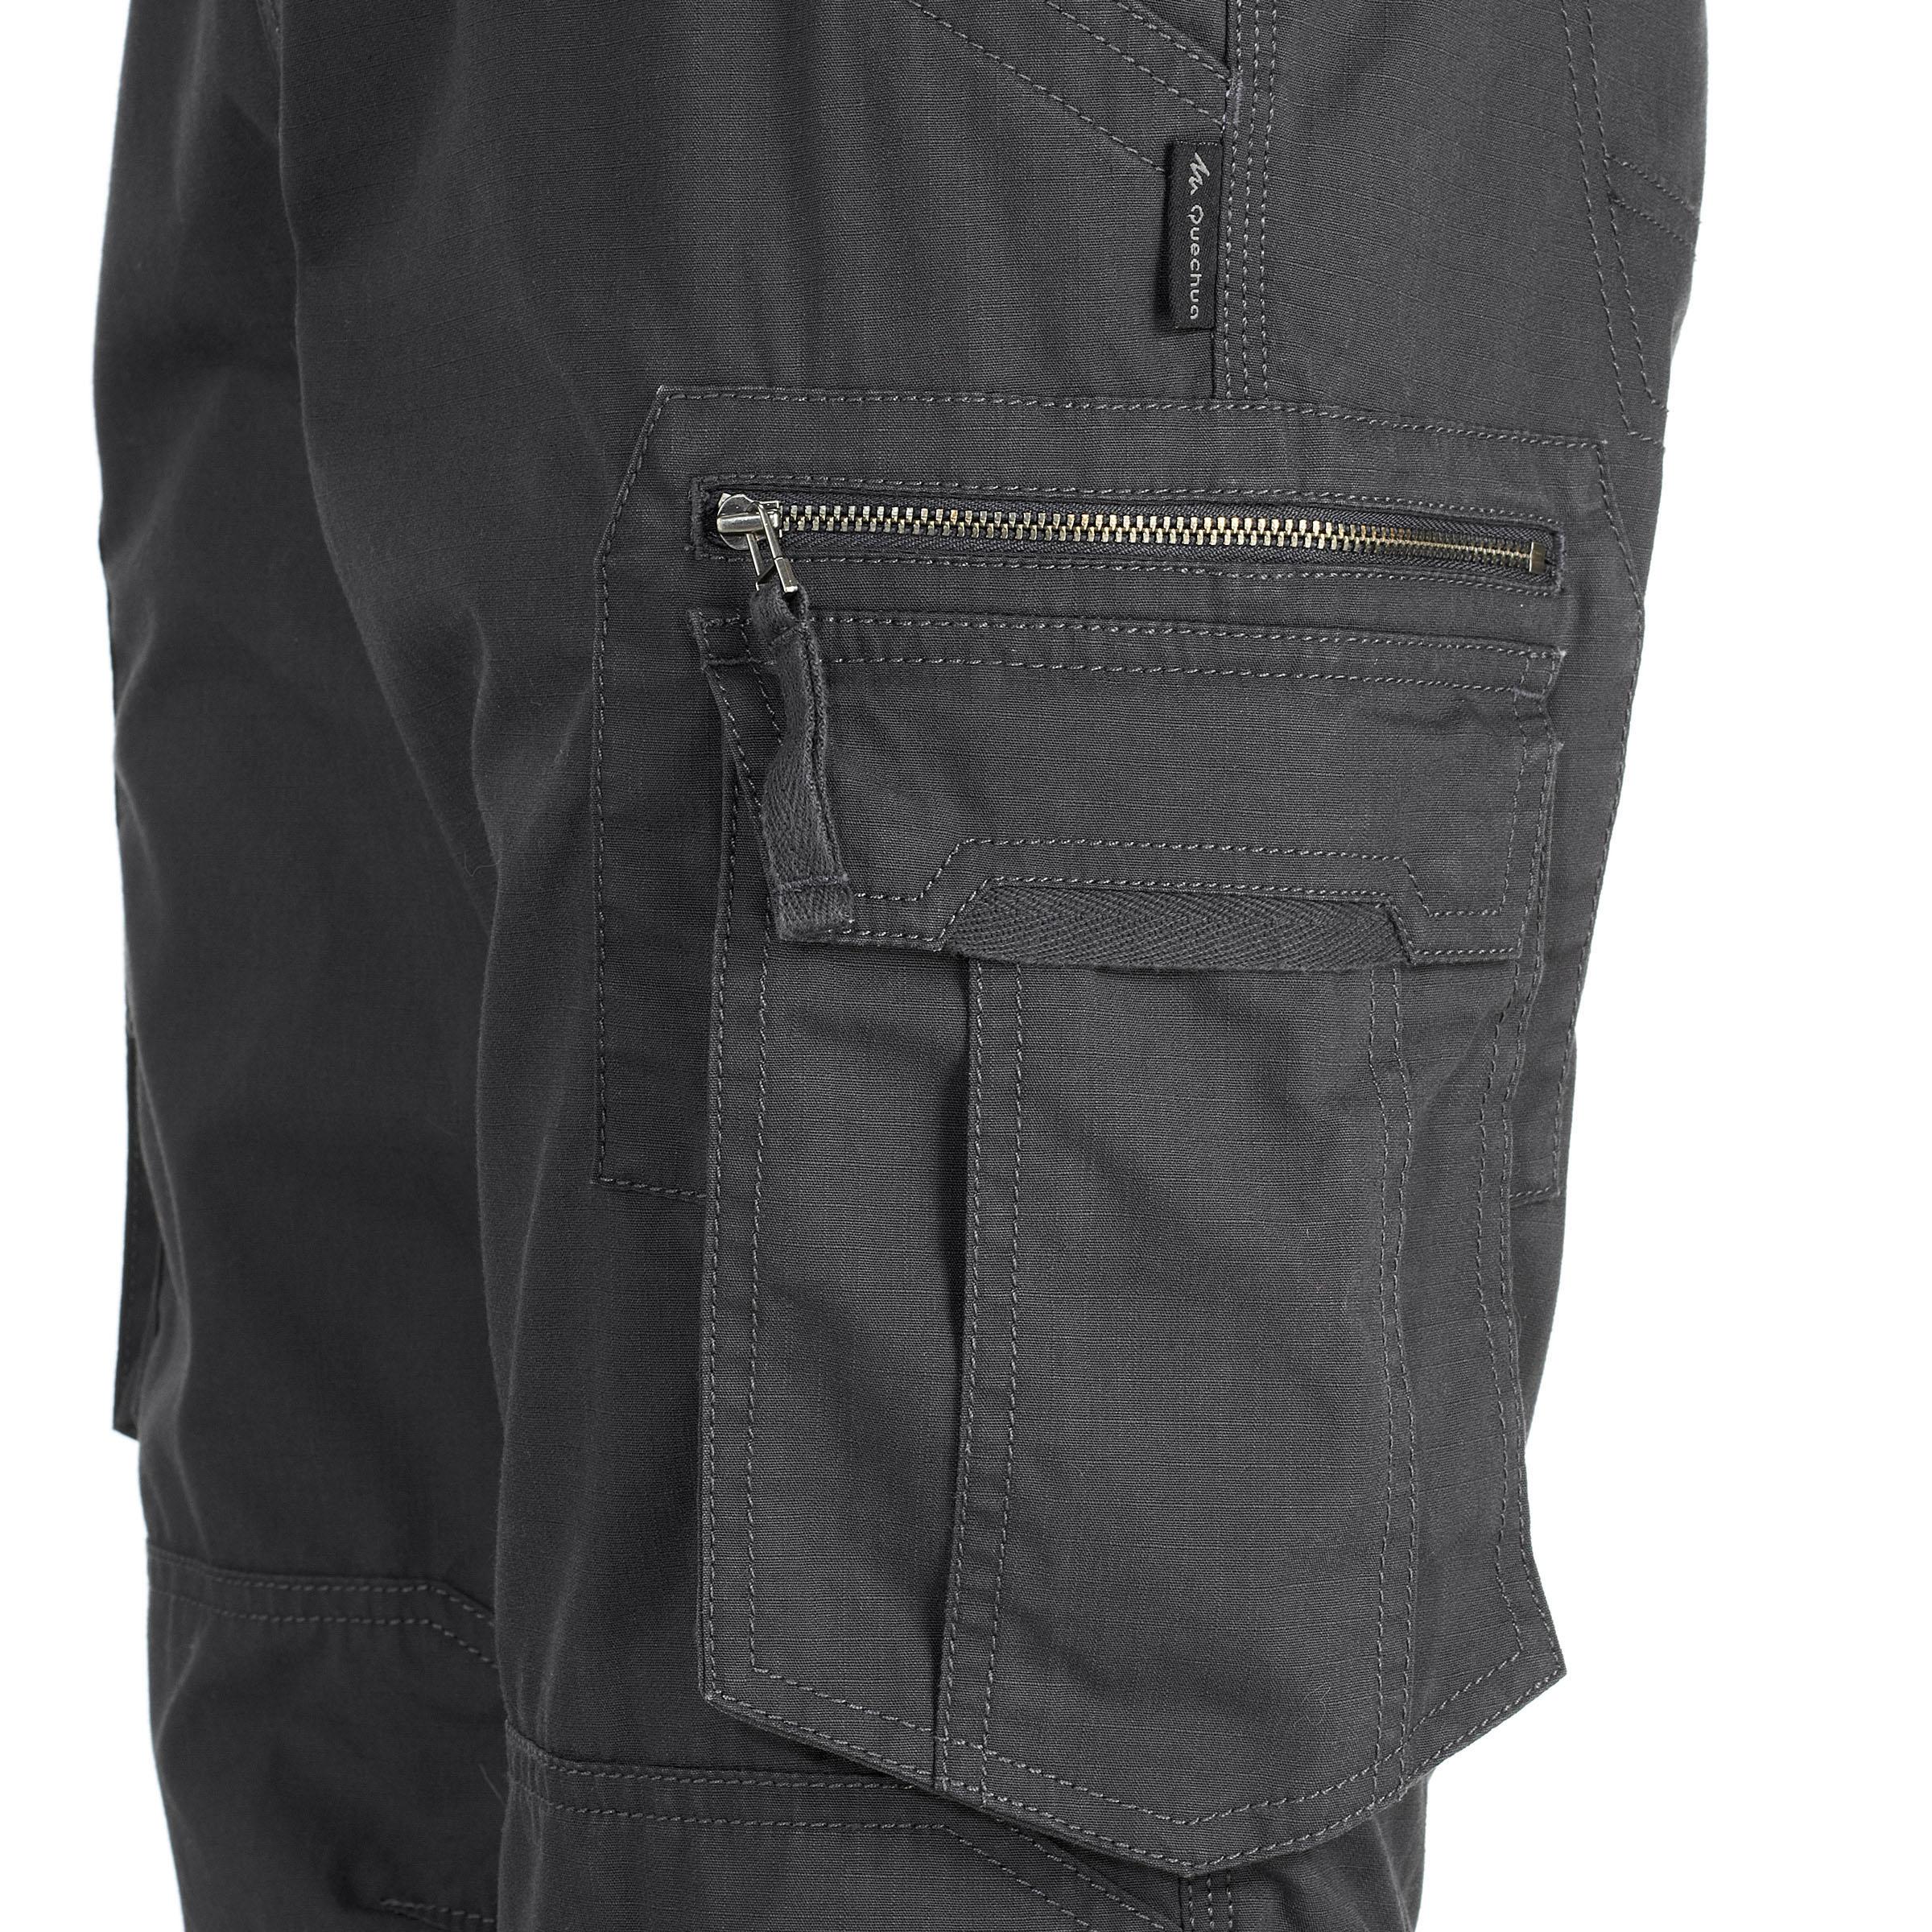 Travel 100 Men's Trousers - Dark Grey